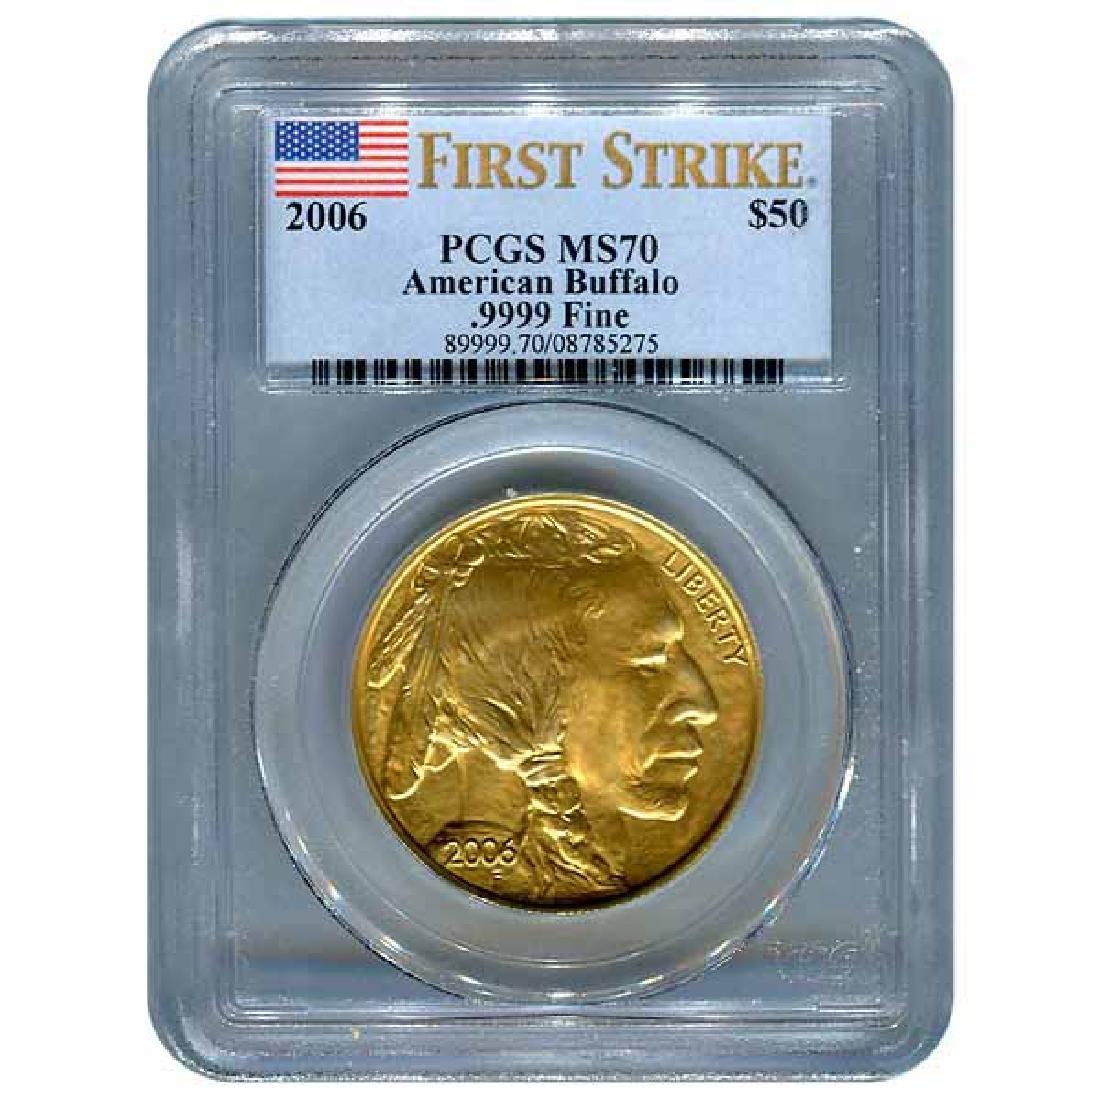 Certified Uncirculated Gold Buffalo 2006 MS70 PCGS Firs